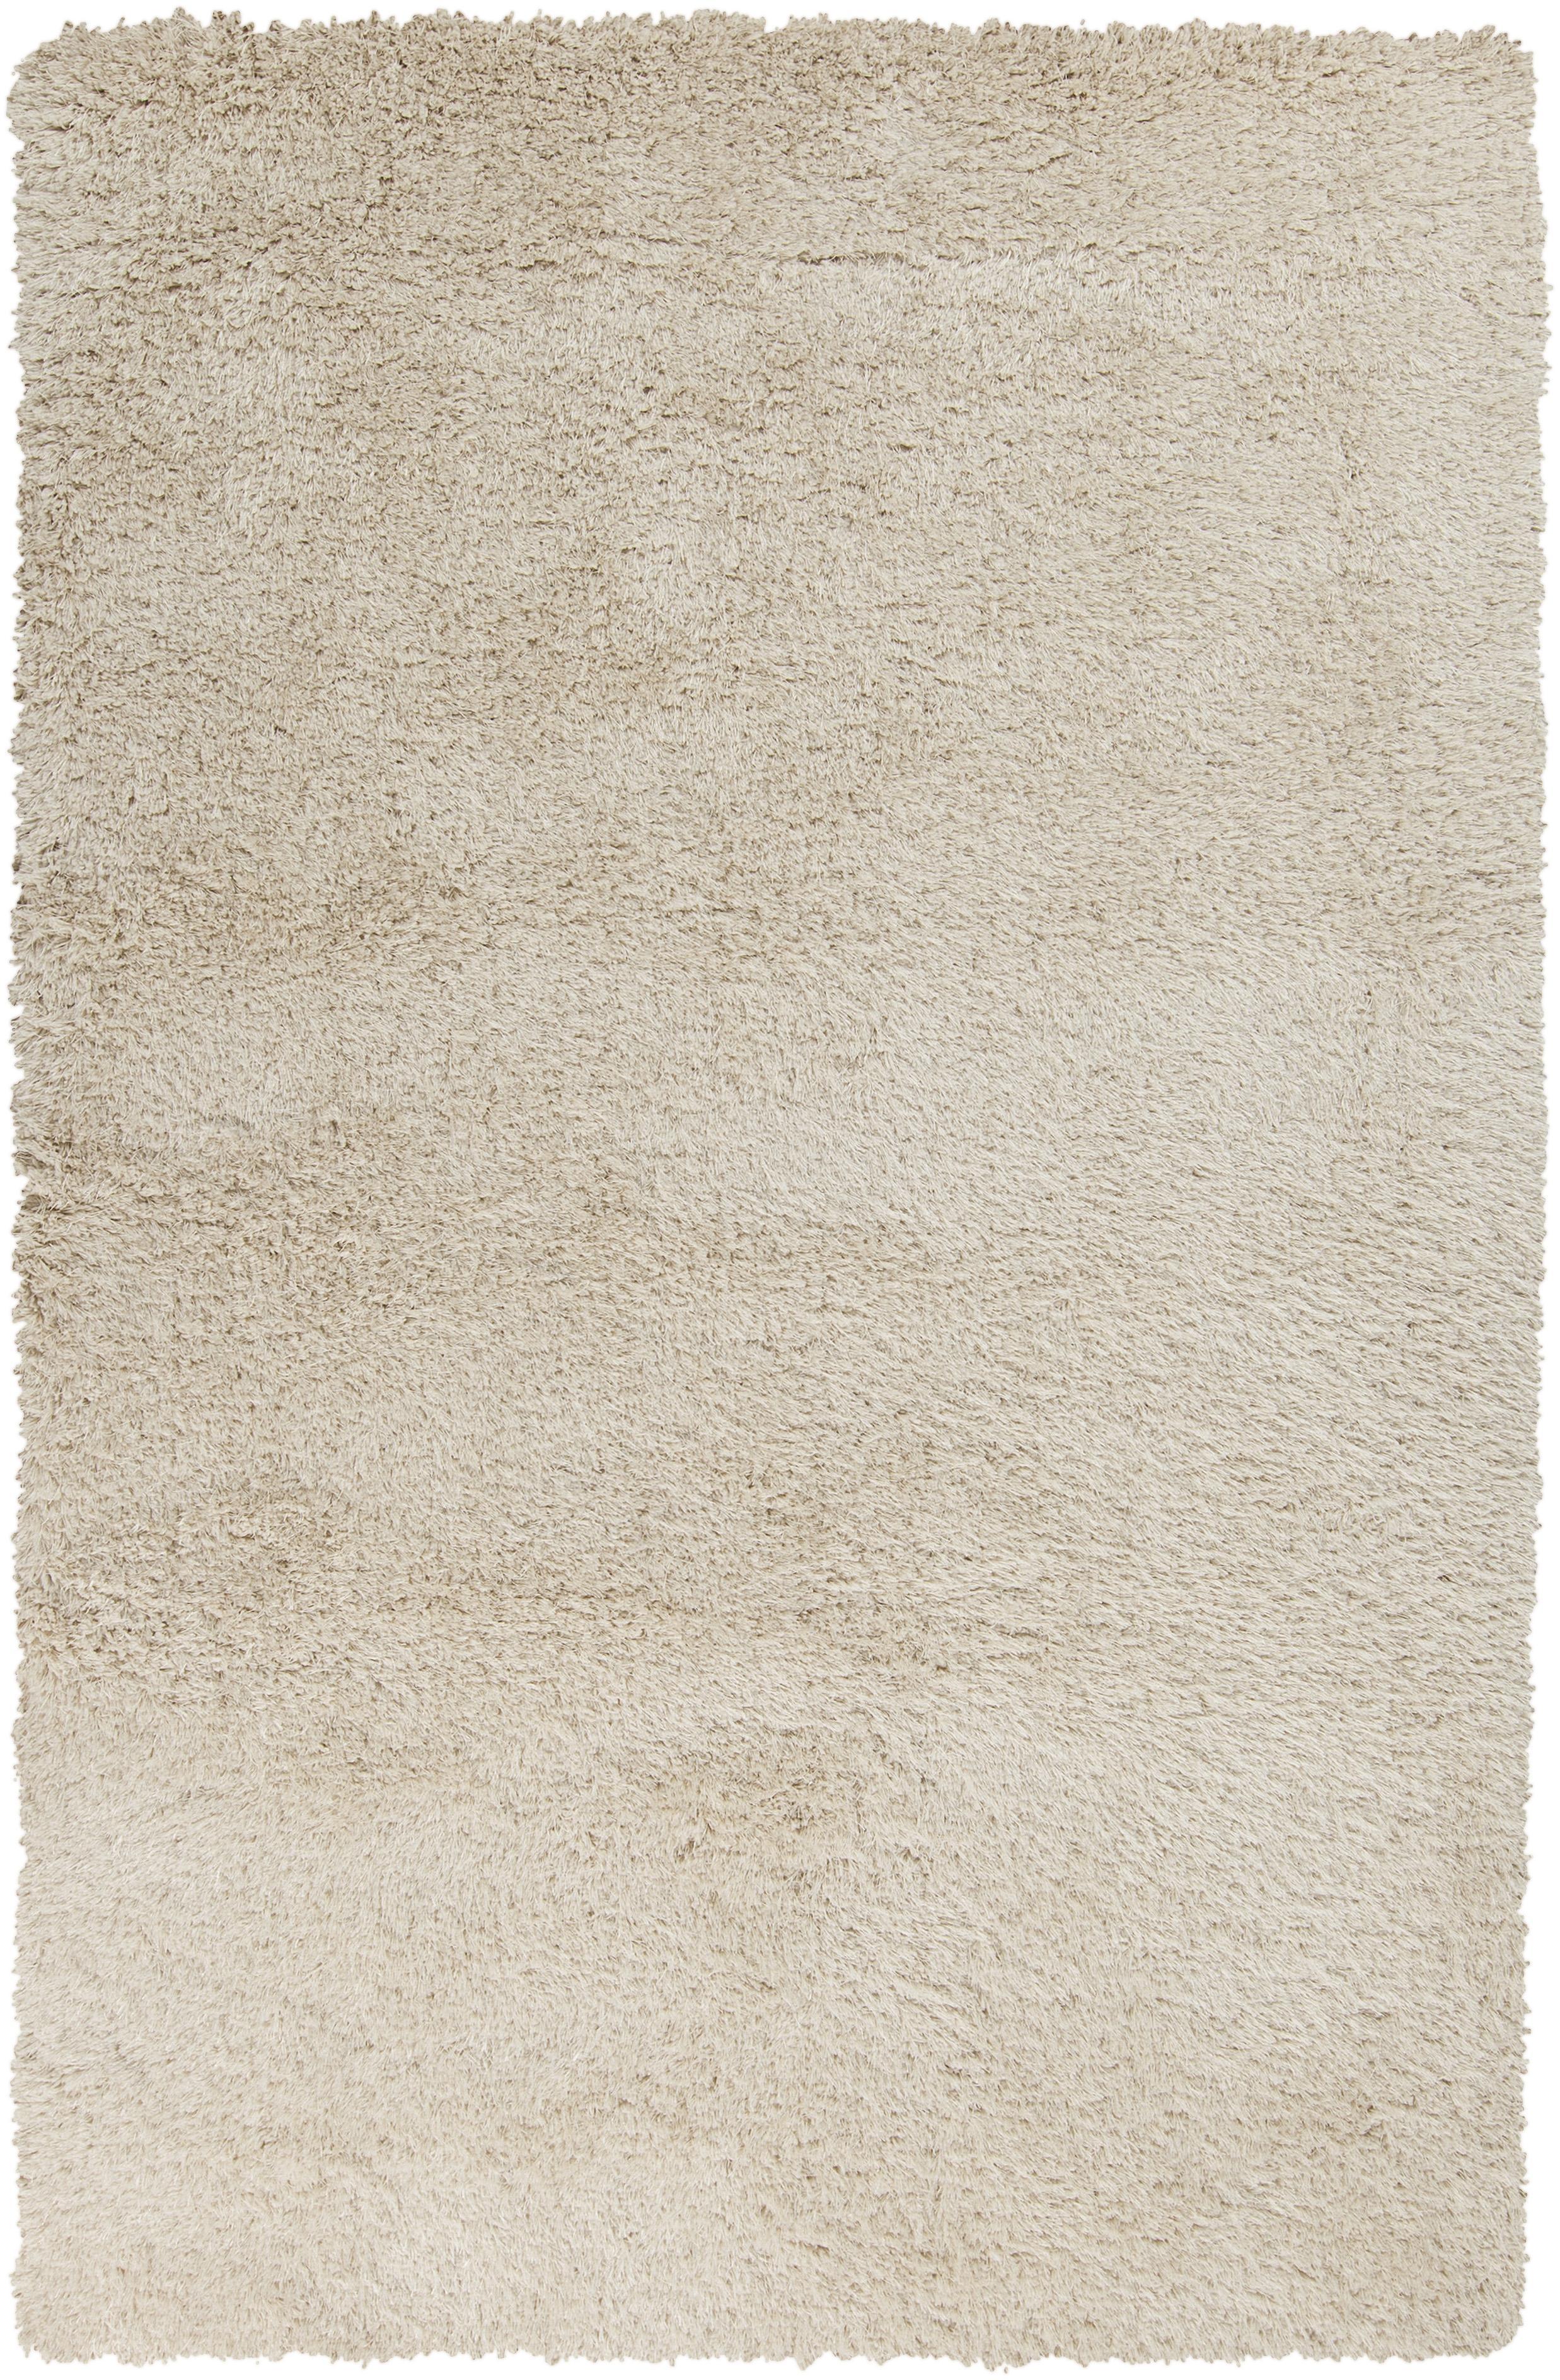 Surya Rugs Portland 8' x 11' - Item Number: PLD2001-811